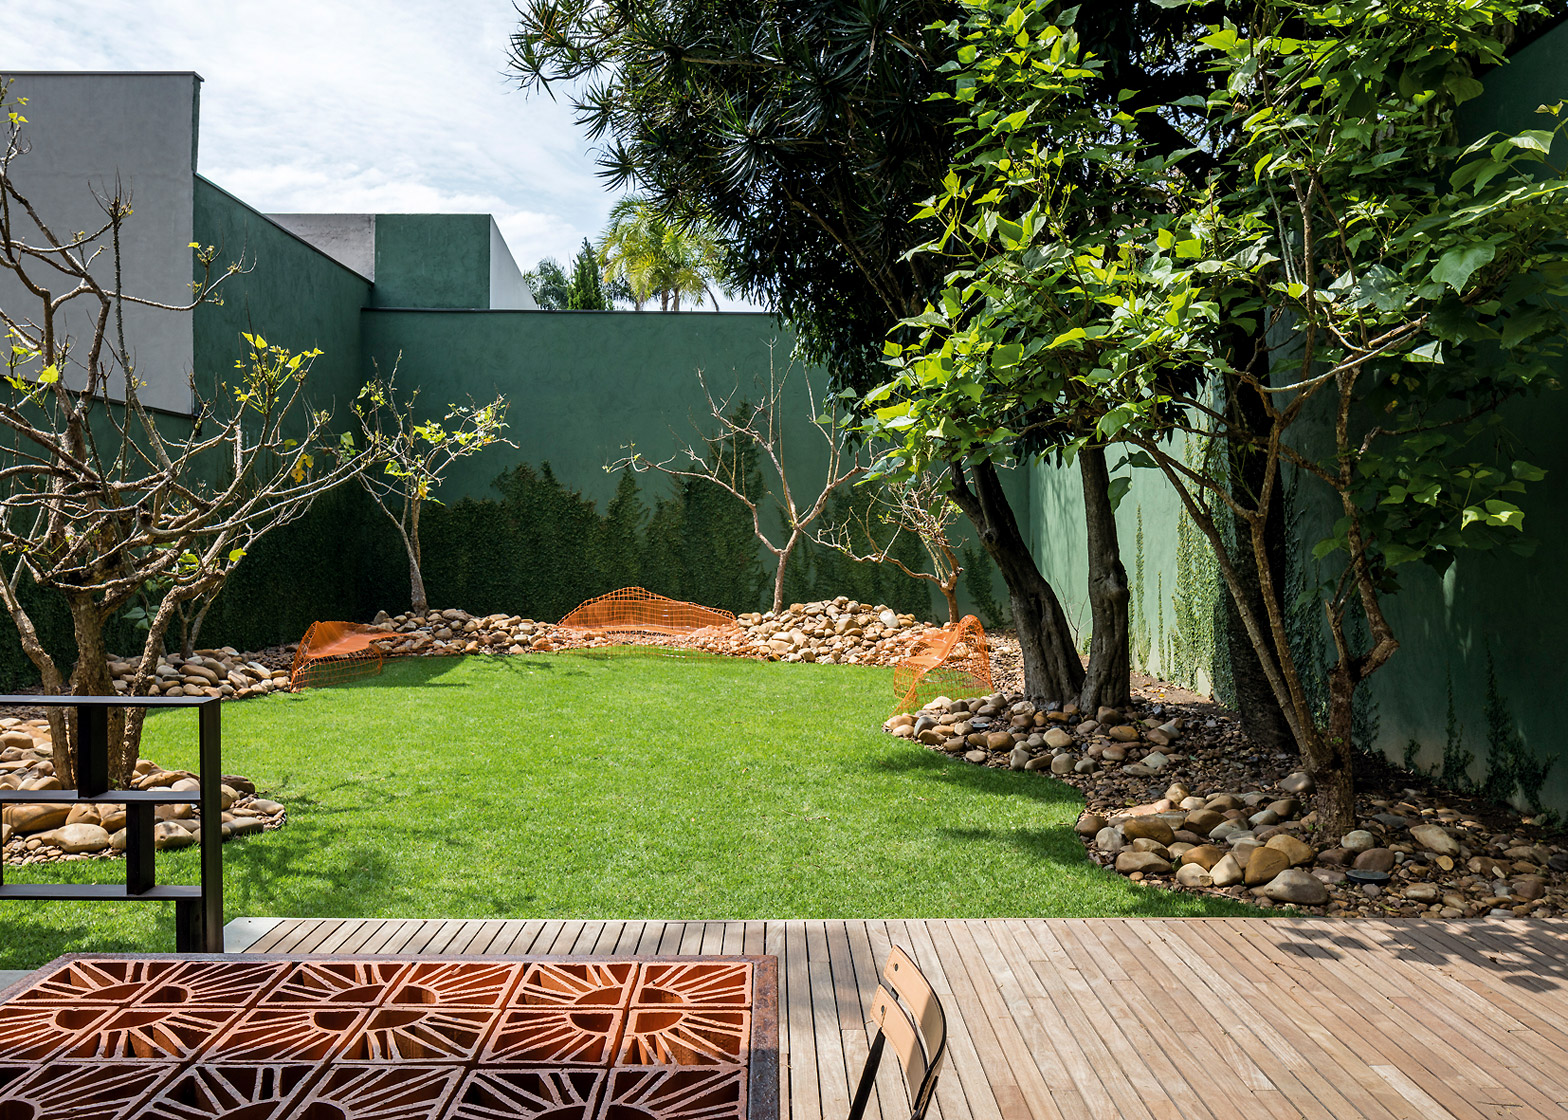 private-house-studio-campanas-sao-paulo-designers-architecture-piassava-palm-fibre-facade-leonardo-finotti-photography_dezeen_1568_0.jpg